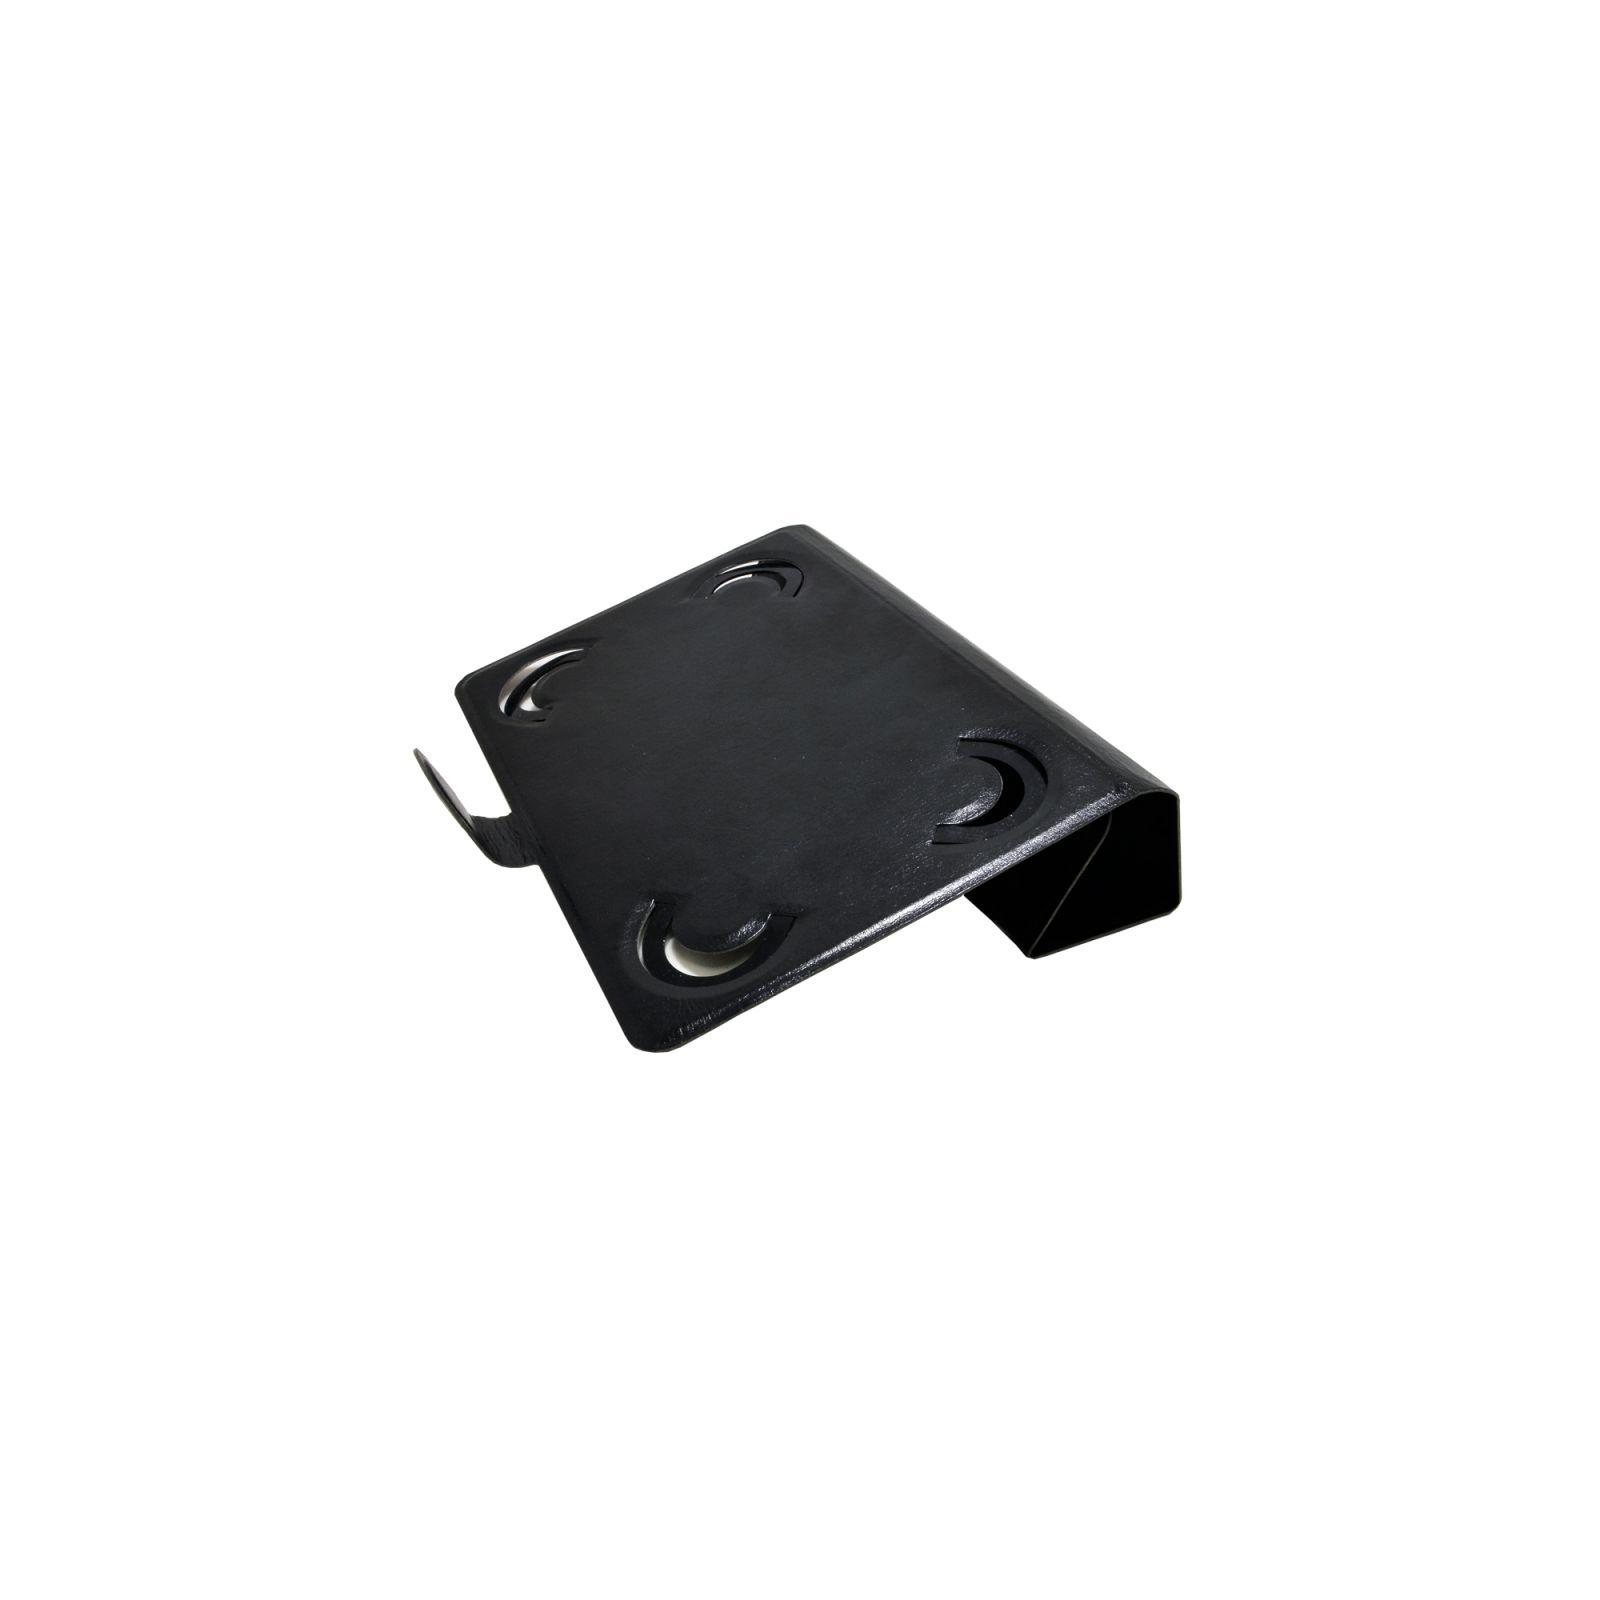 "Чехол для планшета Pro-case 9-10"" унiверсальний three folders black + black (PCTFCUN910BB) изображение 4"